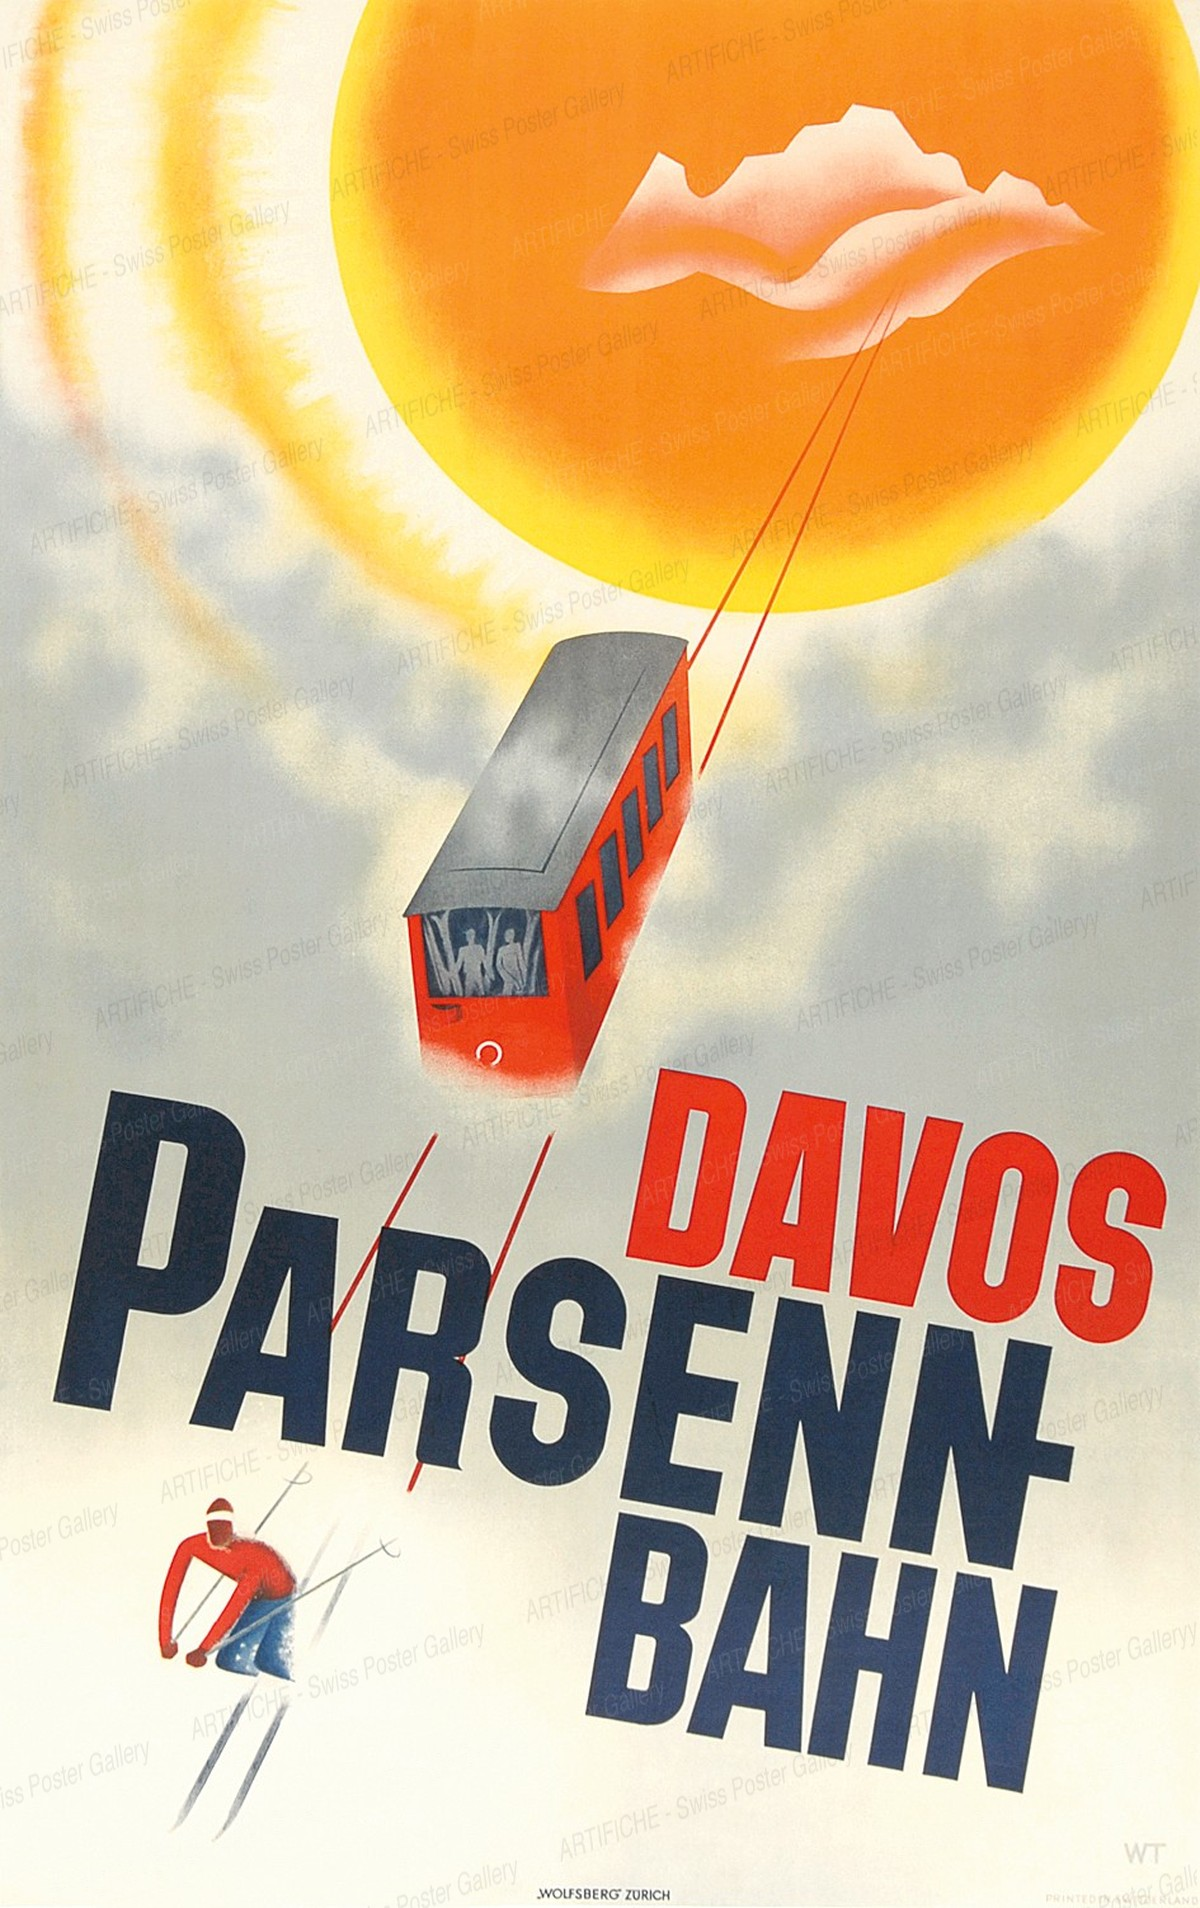 DAVOS Parsenn-Bahn, Willy Trapp